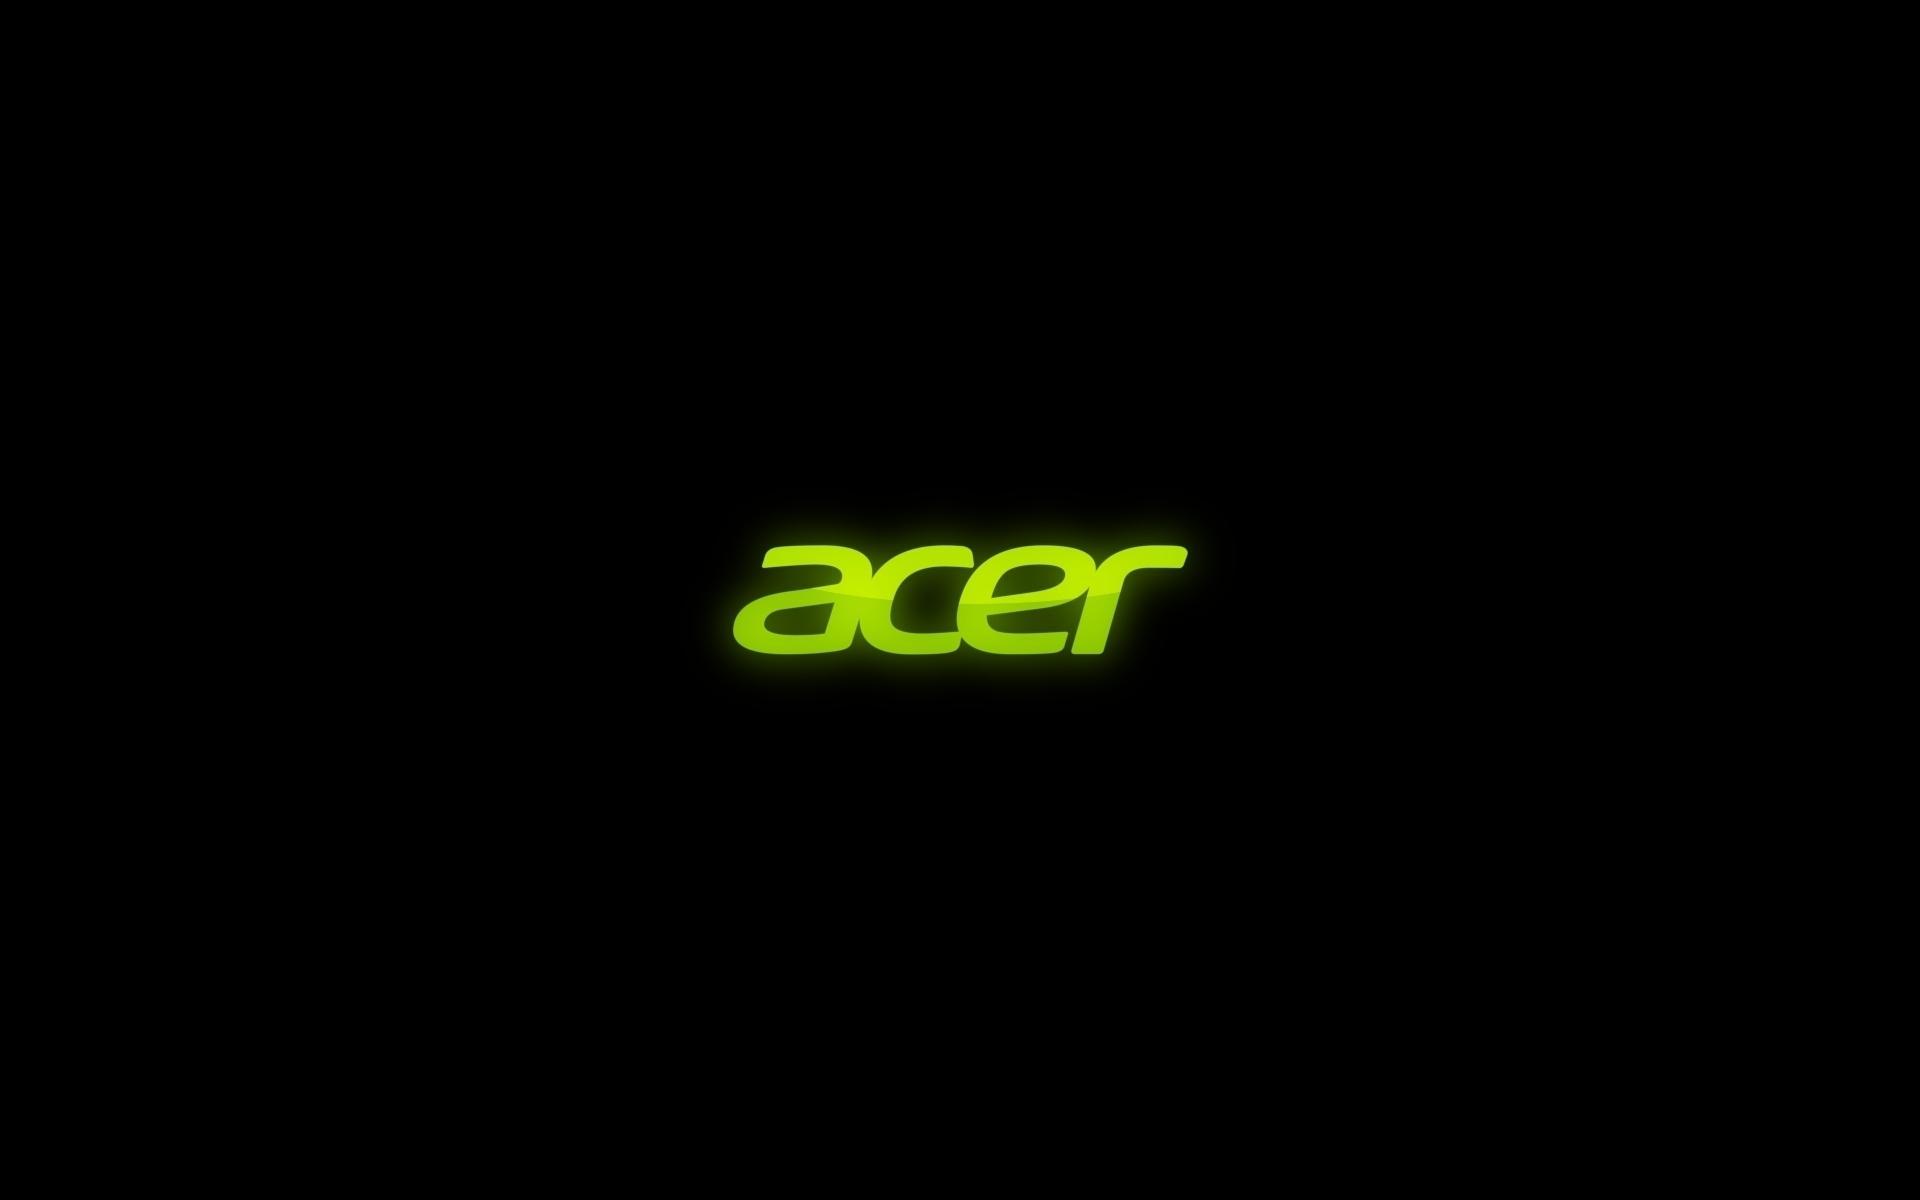 Acer на черном фоне (1920х1200)